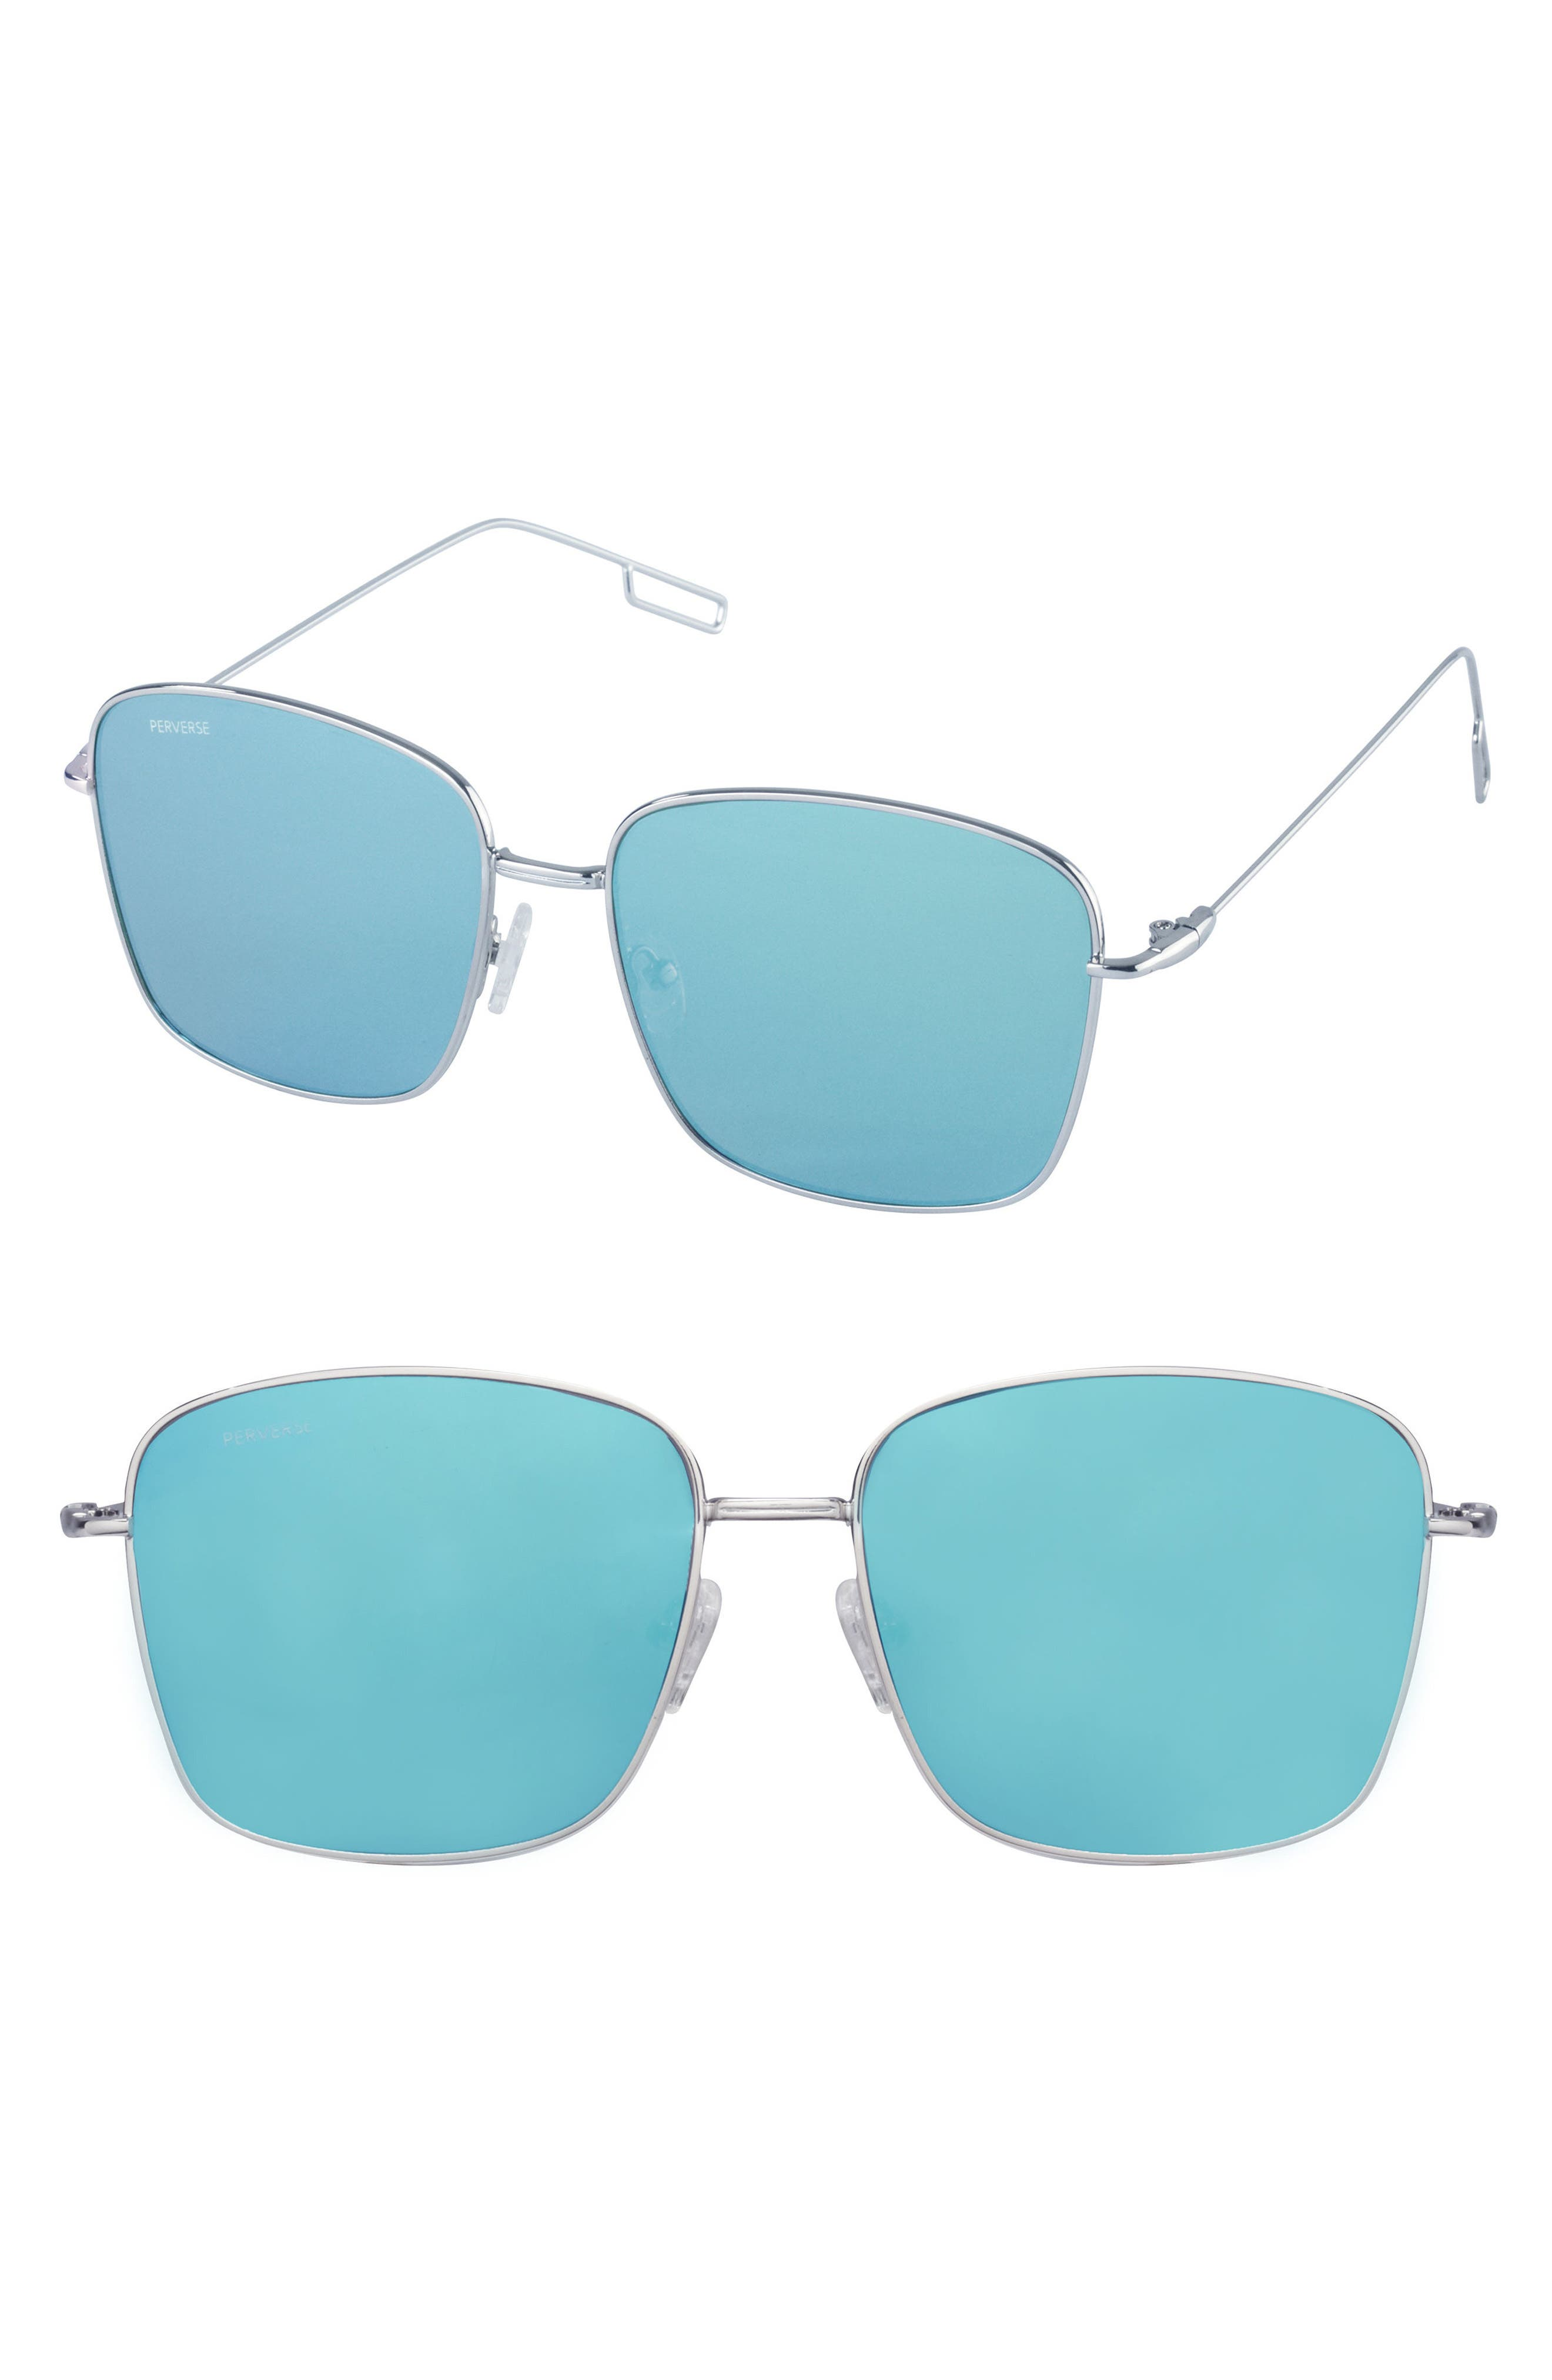 Emily 58mm Mirrored Square Sunglasses,                         Main,                         color, 400